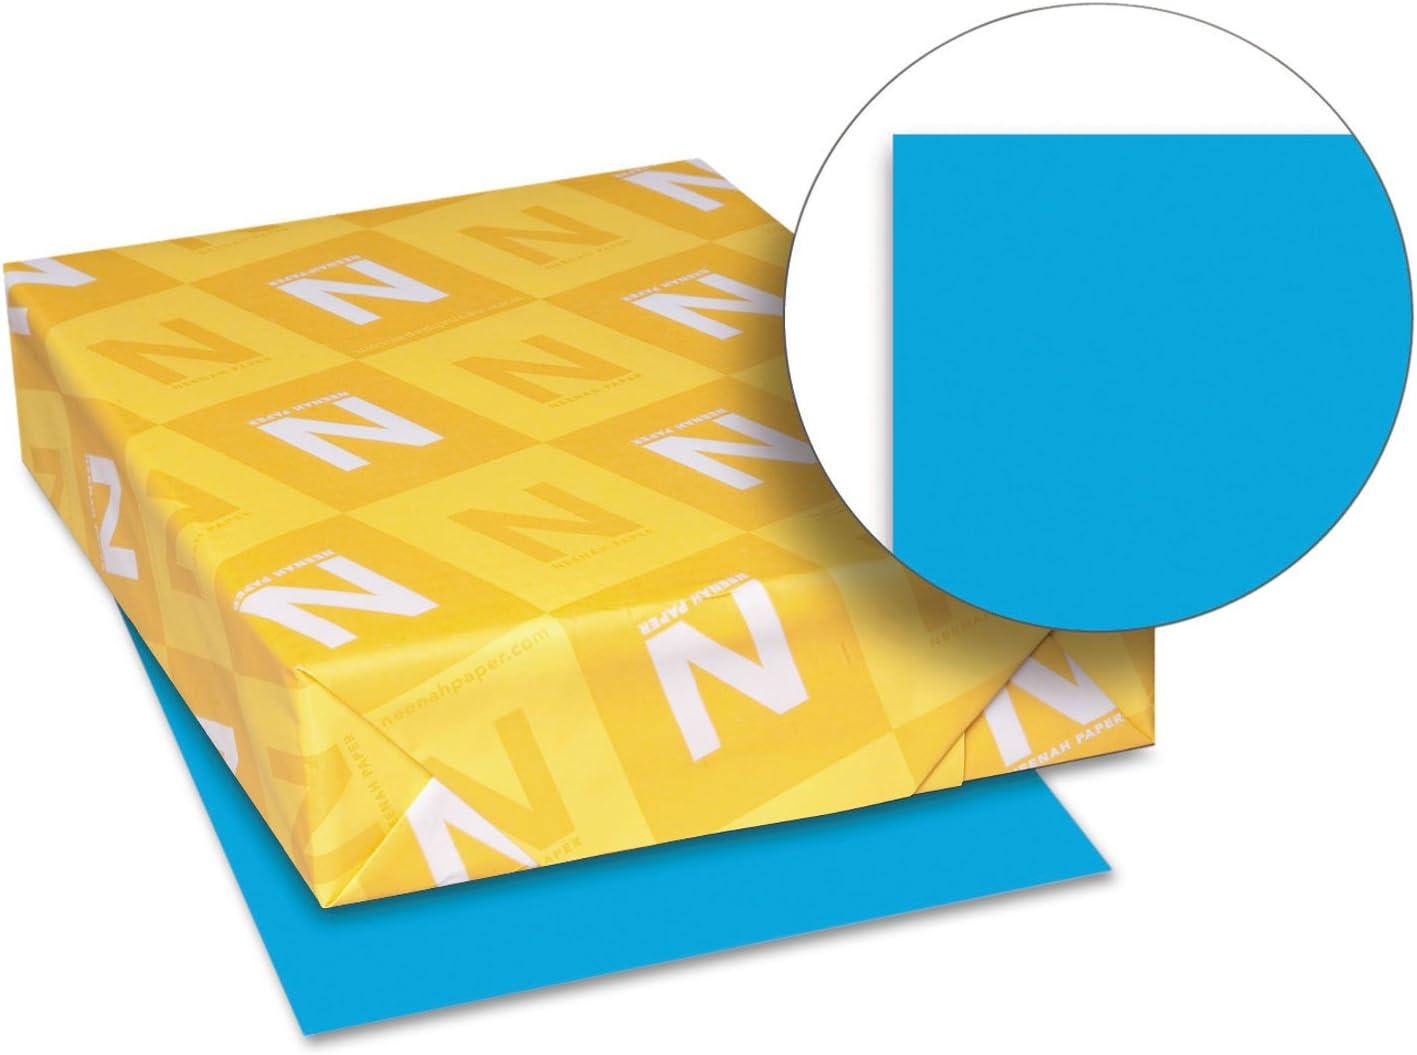 Neenah Paper 22861 Color service Cardstock 65lb 1 11 2 x 8 Mesa Mall Celestial